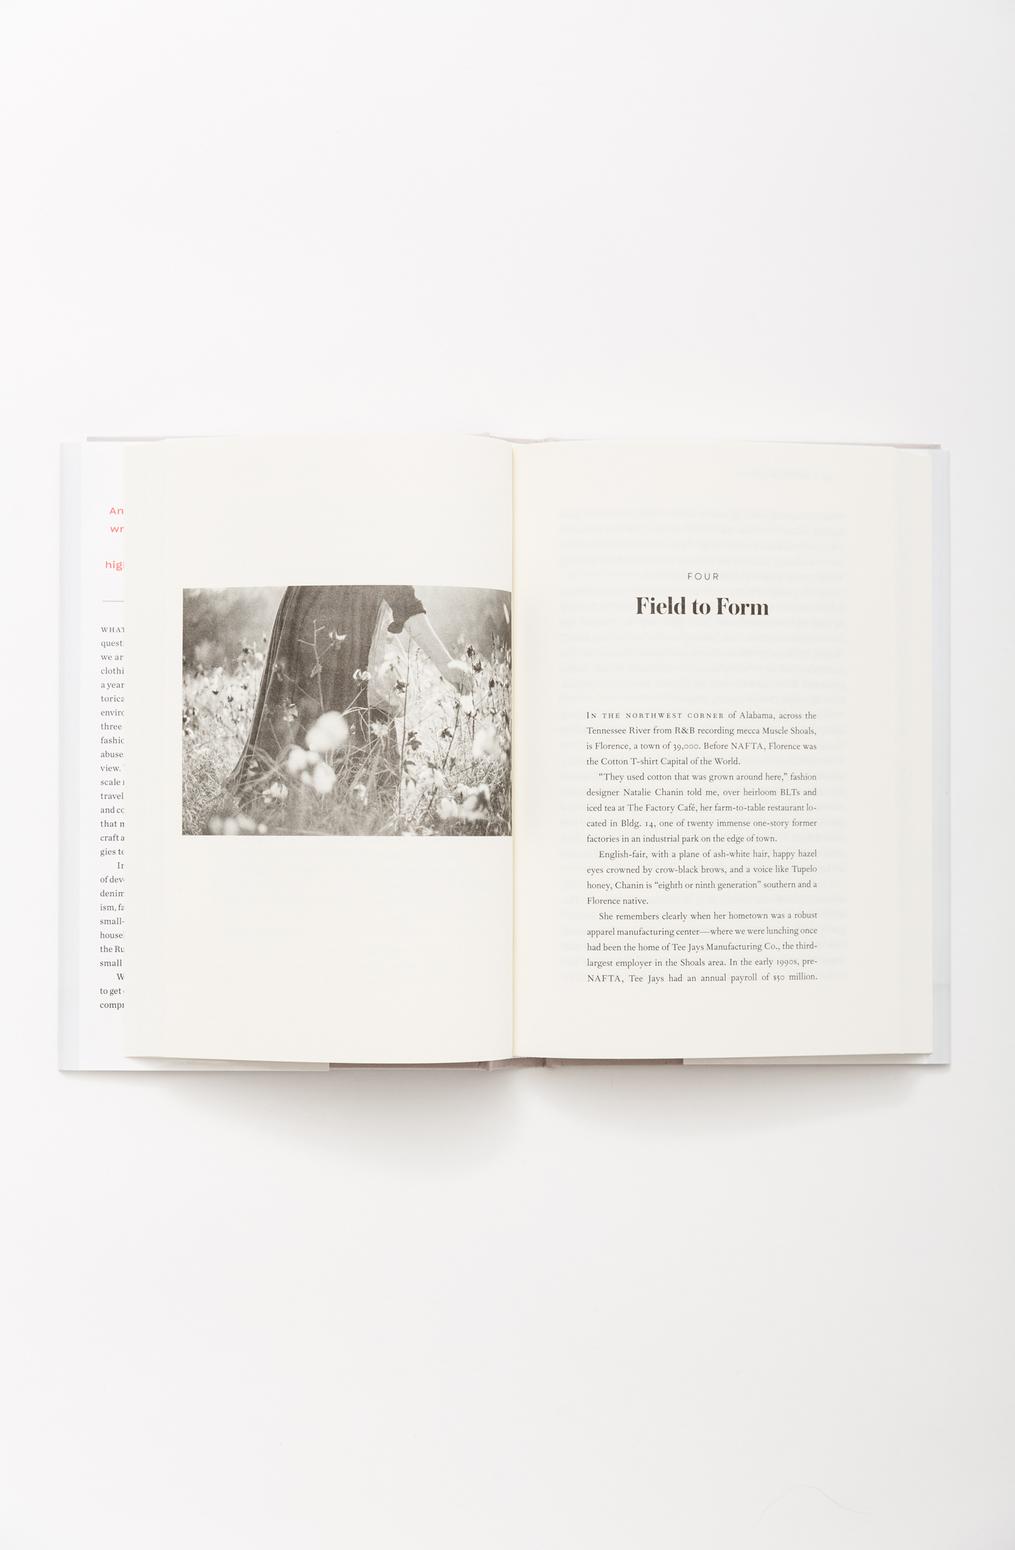 Alabama chanin dana thomas fashionopolis book3